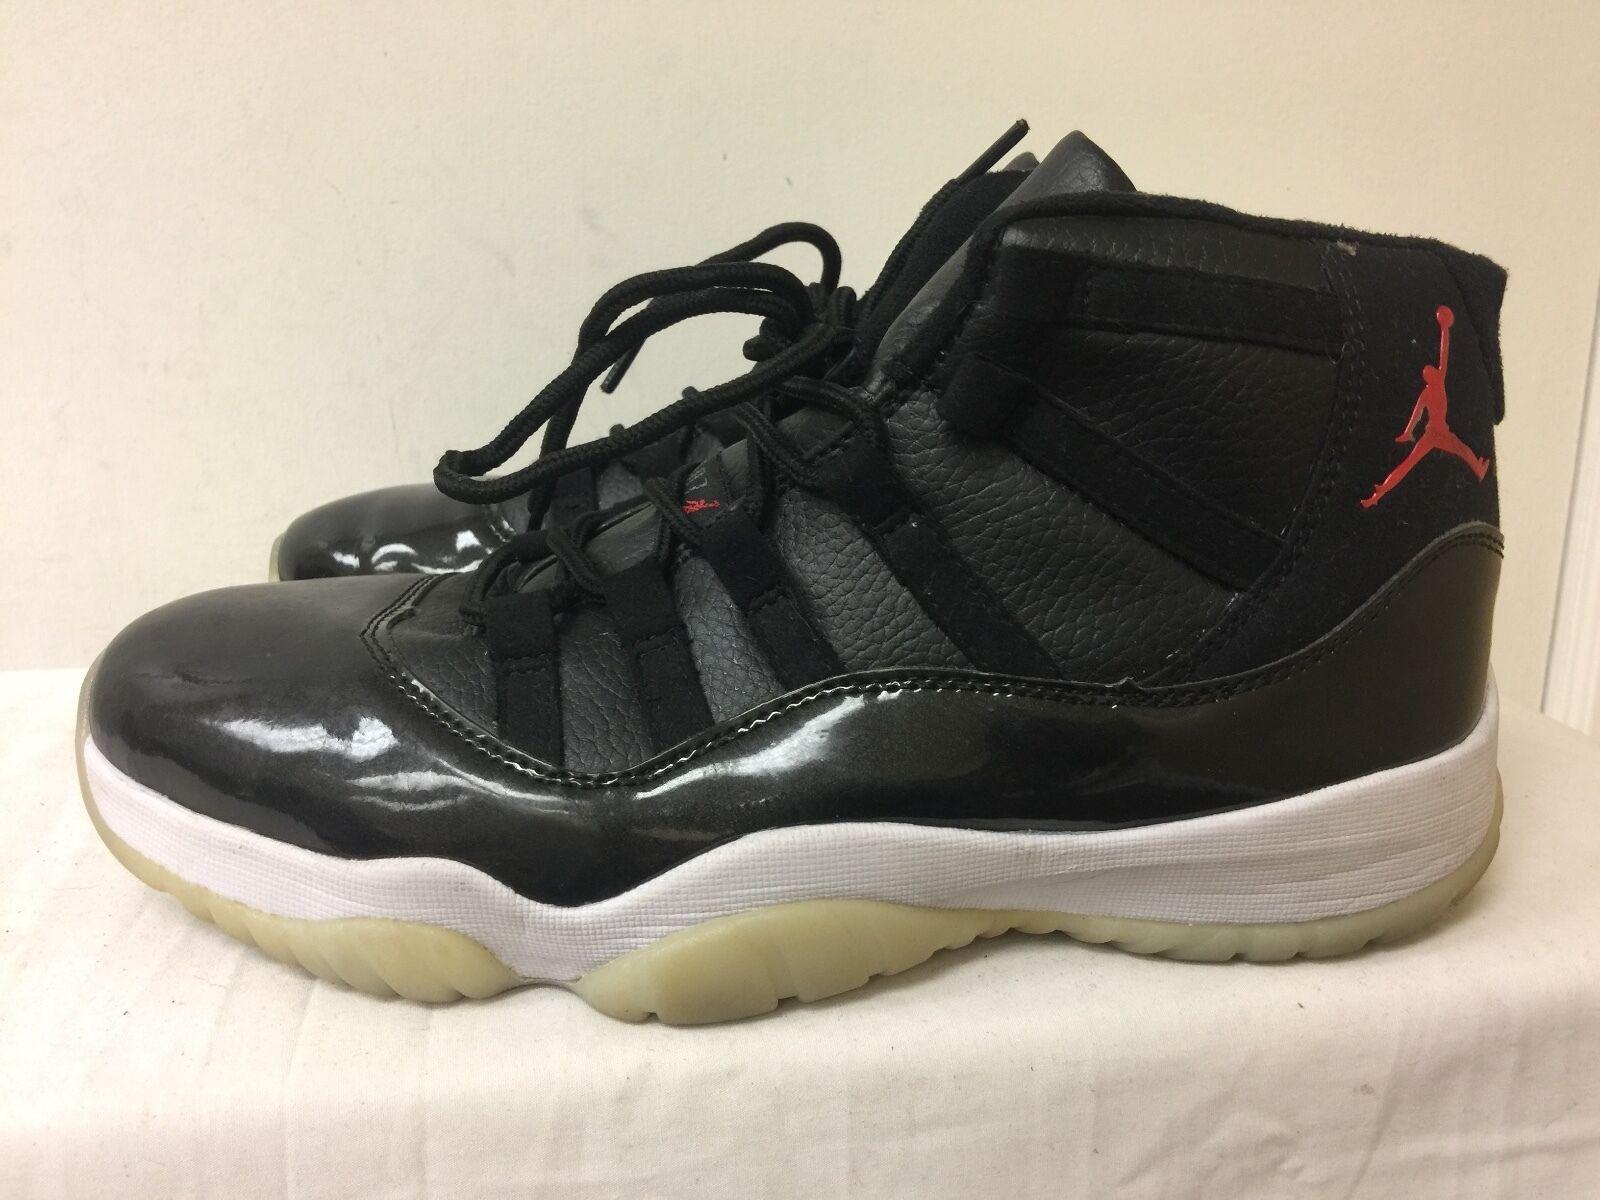 Nike air jordan 2010 uomini taglia 10 nero / bianco scarpe / rosso, scarpe bianco da basket ba6ab3